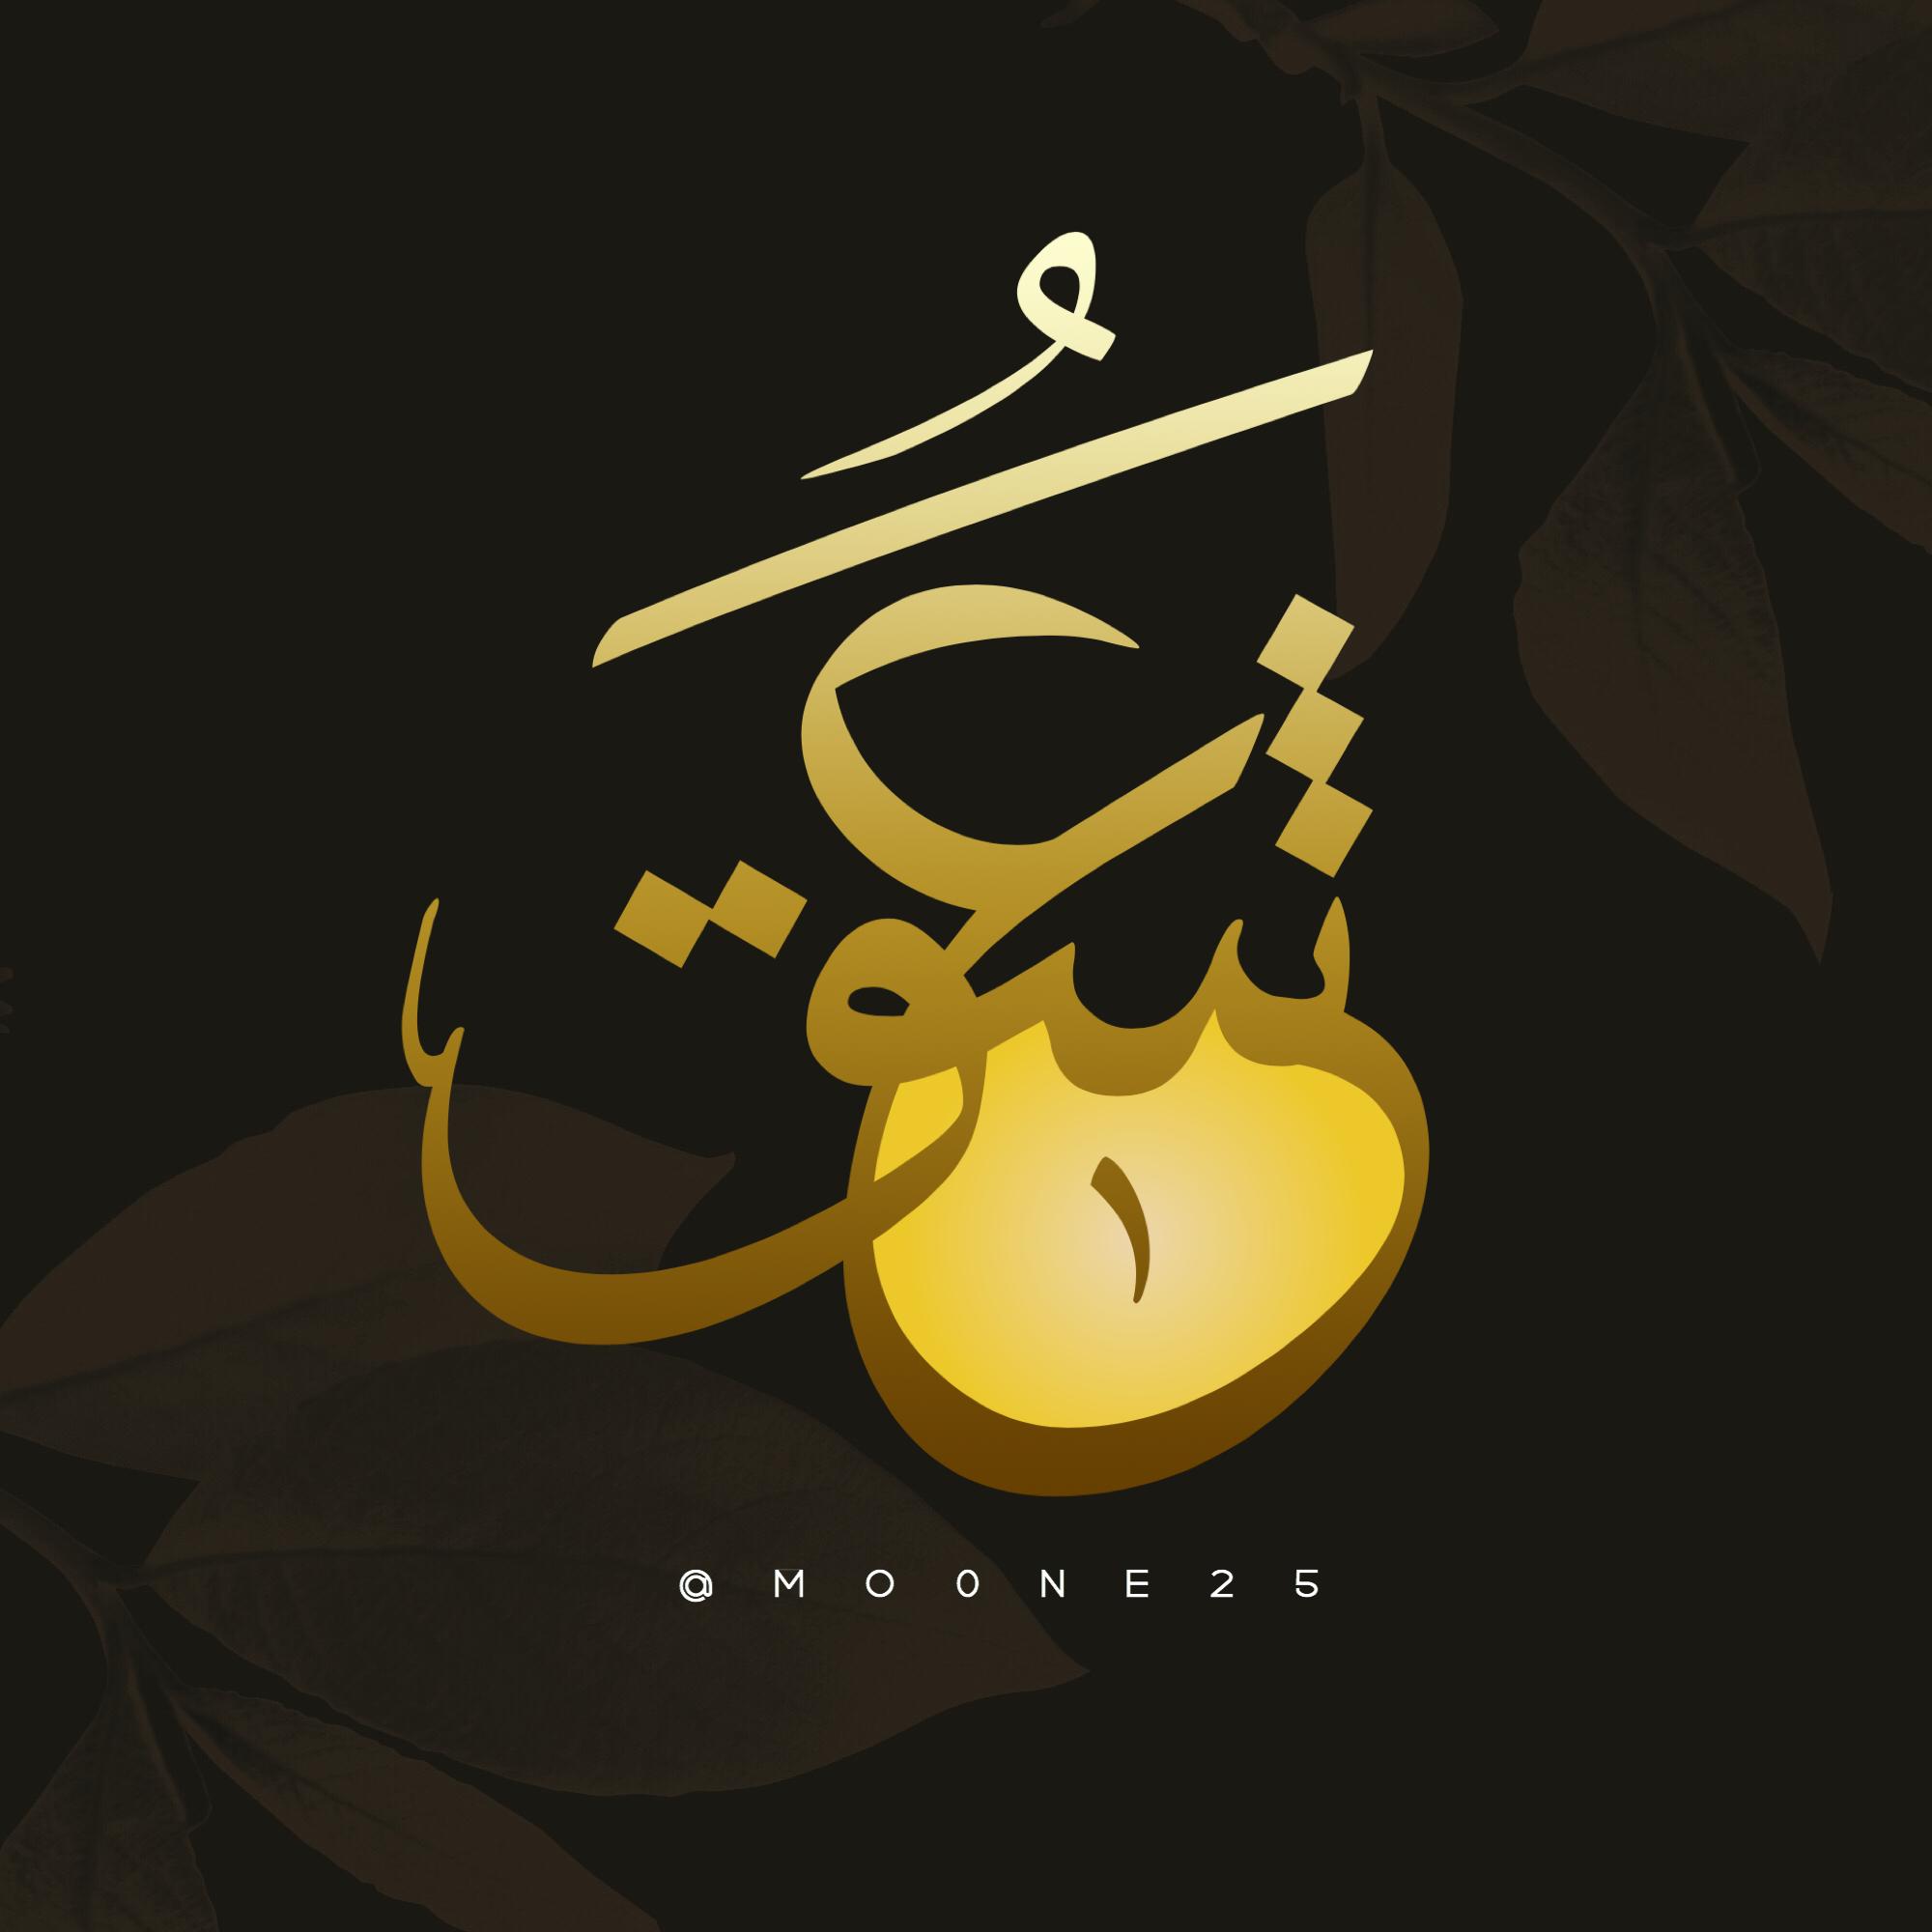 Pin By Rahomi Malibari On School Arabic Calligraphy Painting Calligraphy Painting Art